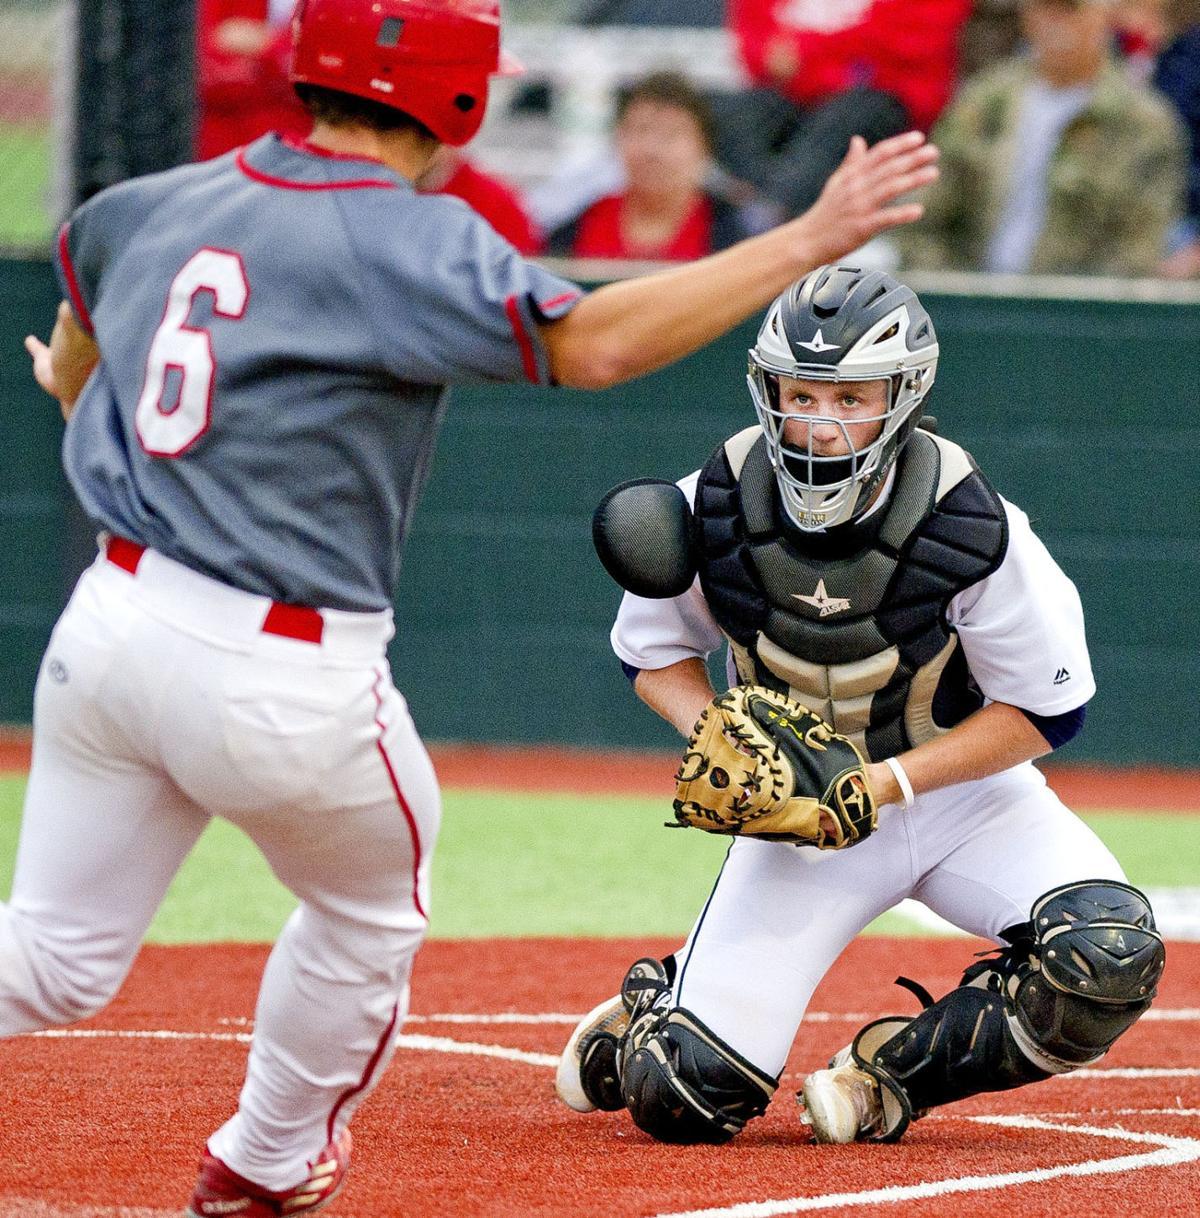 Bryan Baseball Team Drops Opener To Tomball 3 1 Baseball